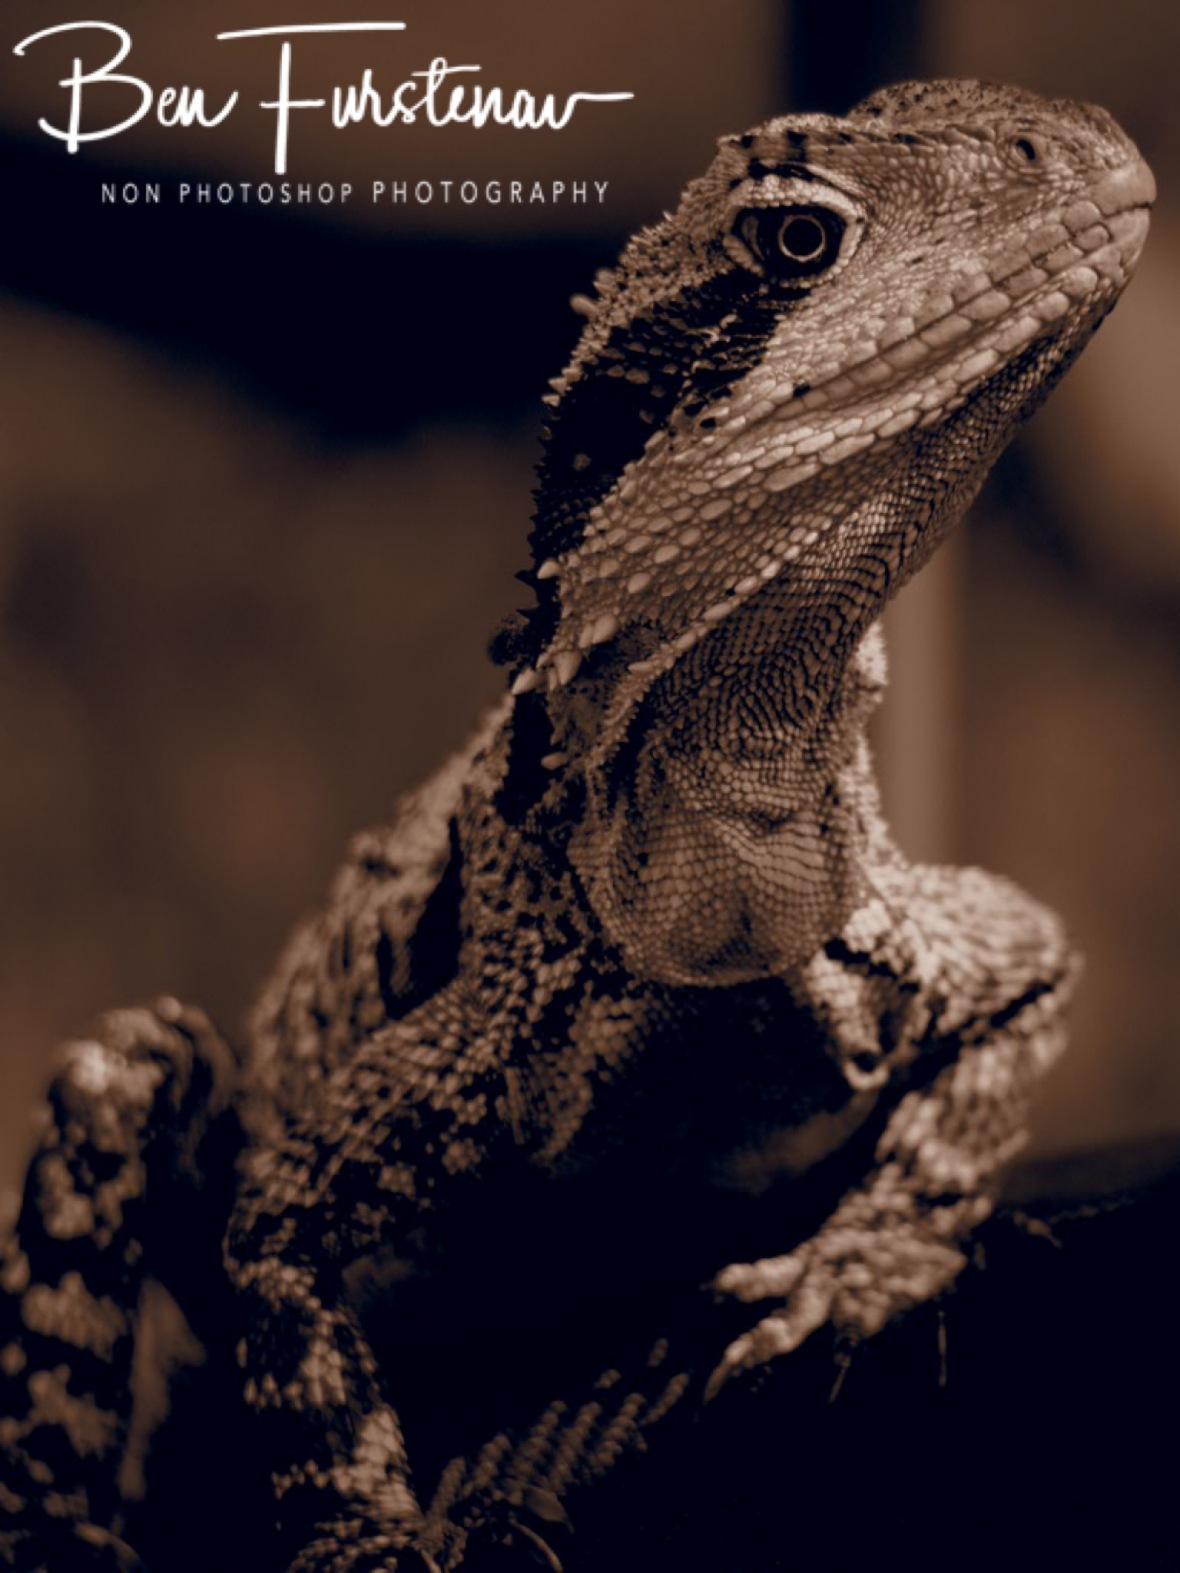 Inquisitive water dragon, Gibraltar Range National Park, NSW, Australia